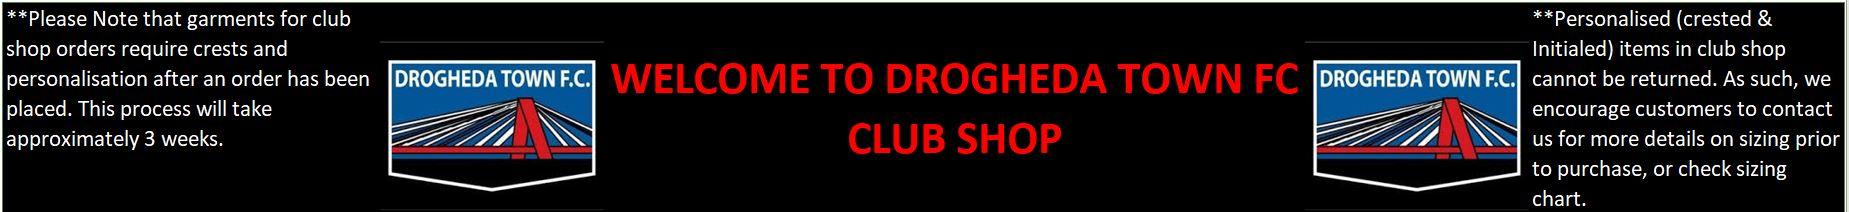 Drogheda Town FC